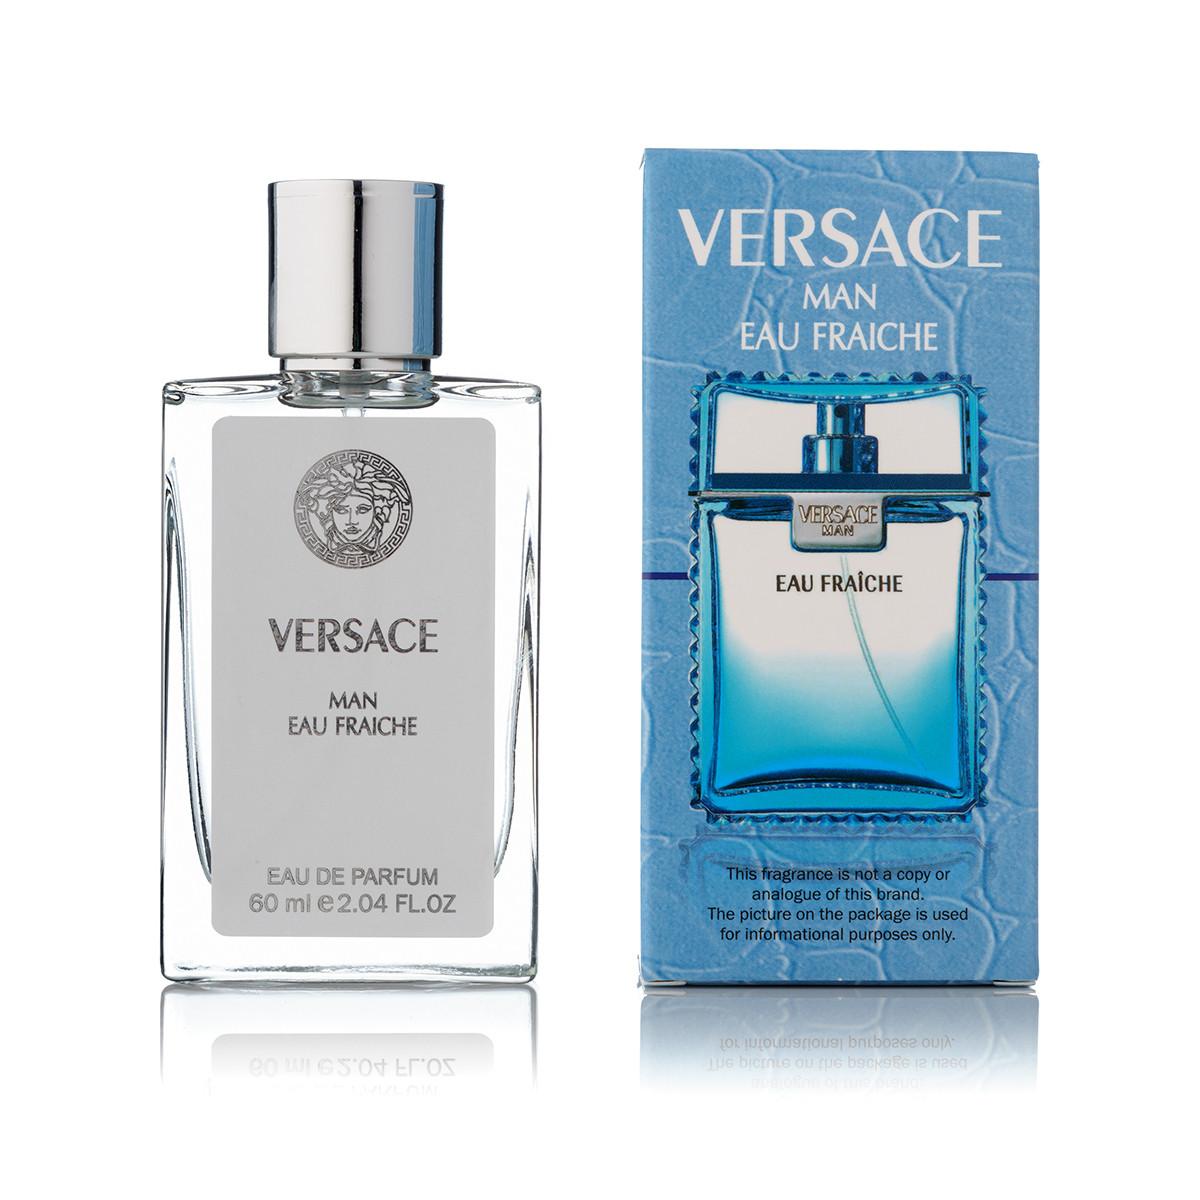 Мужская парфюмерия Versace Man Eau Fraiche (версаче фрэш мэн) тестер 60 ml (реплика)